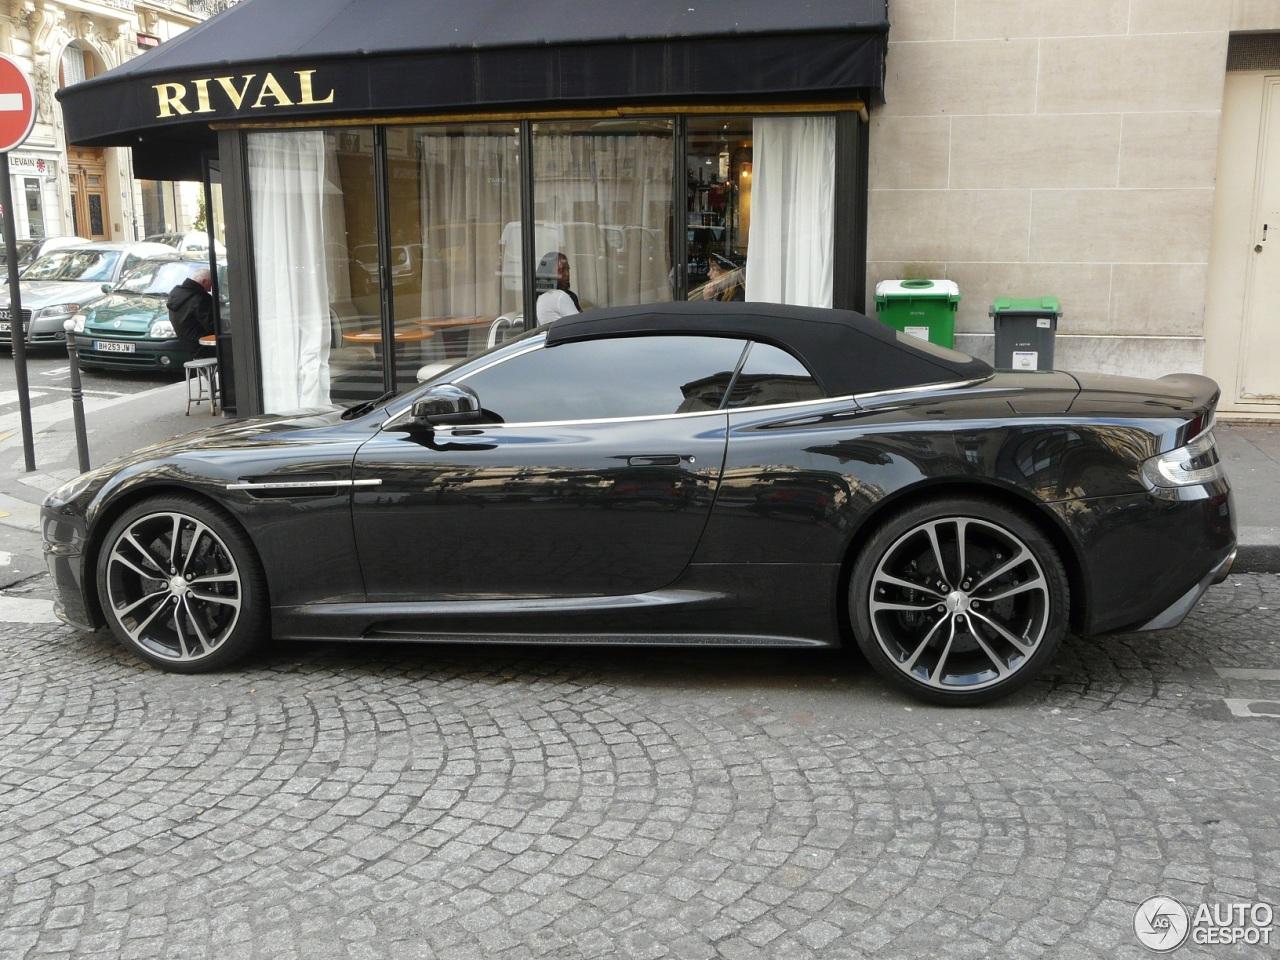 Aston Martin Dbs Volante Carbon Black Edition 20 March